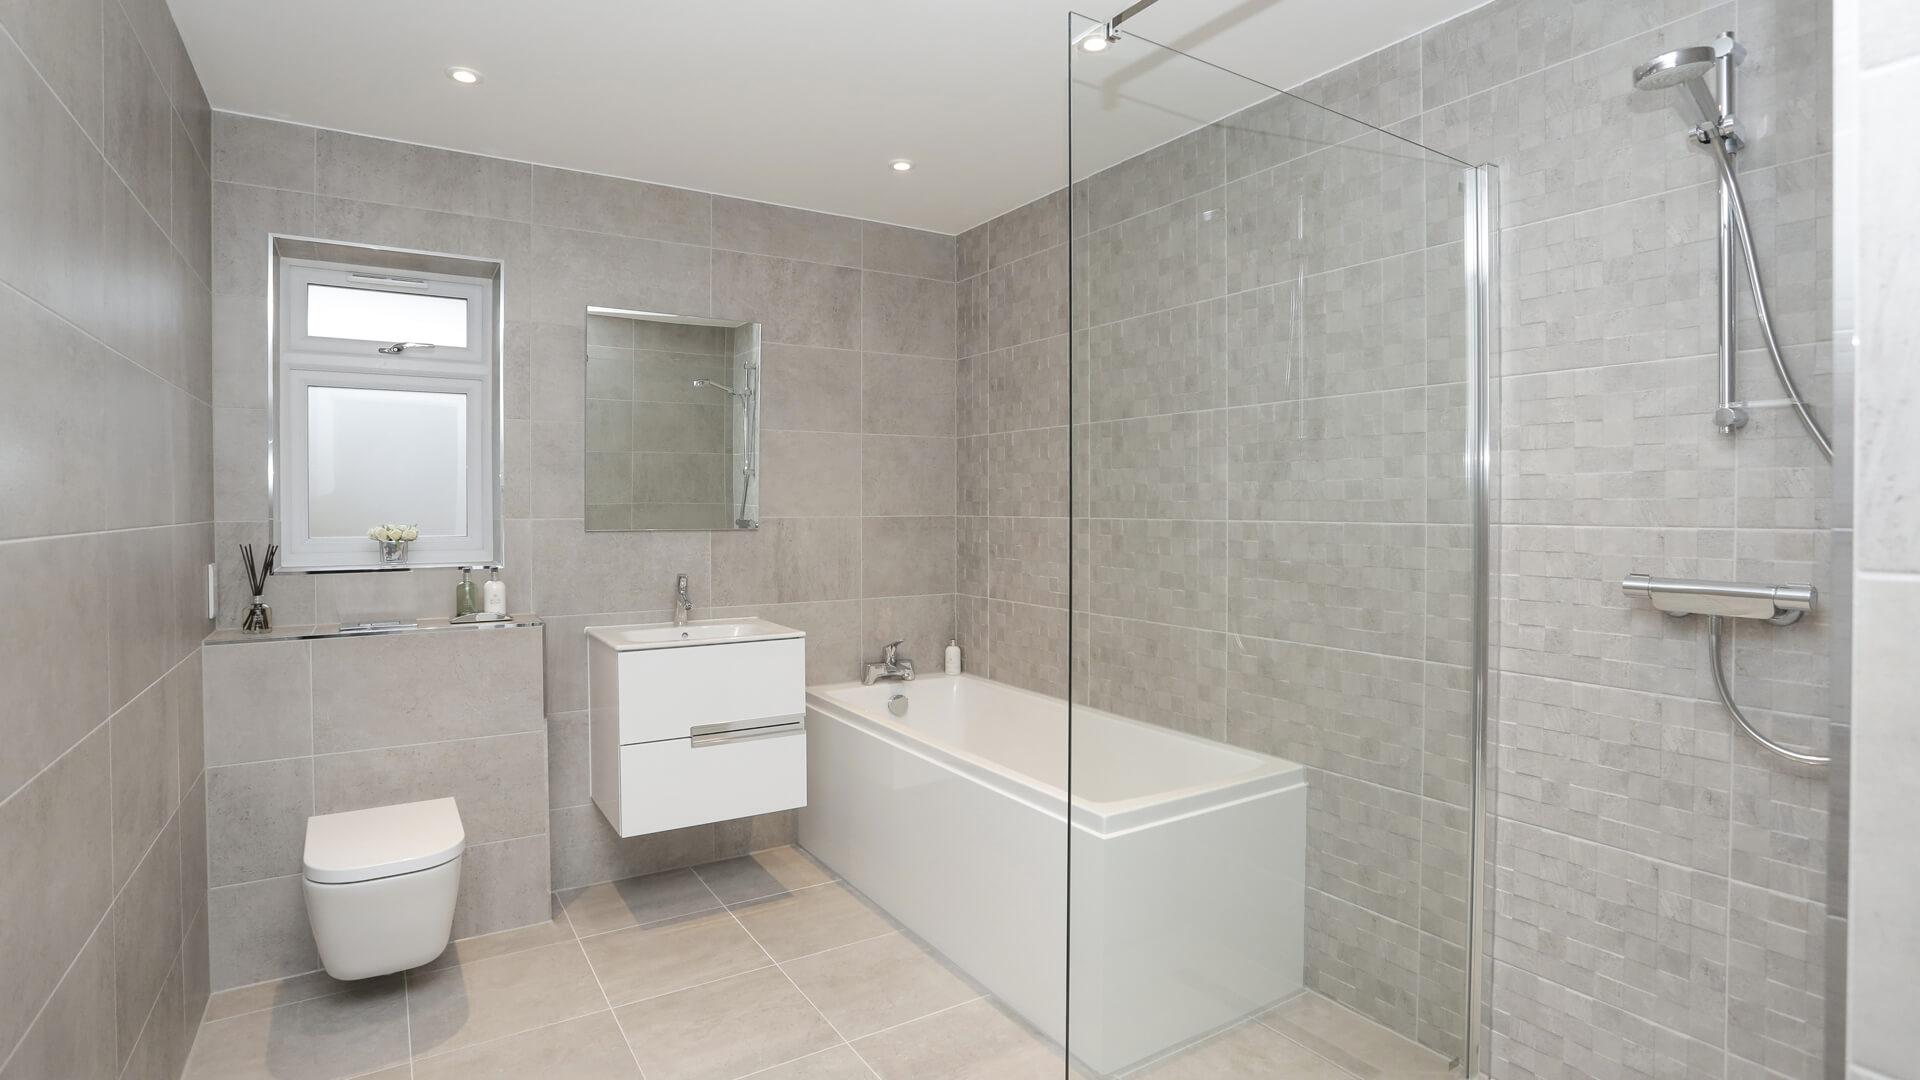 Bathroom with grey tiling, sink, toilet and bath